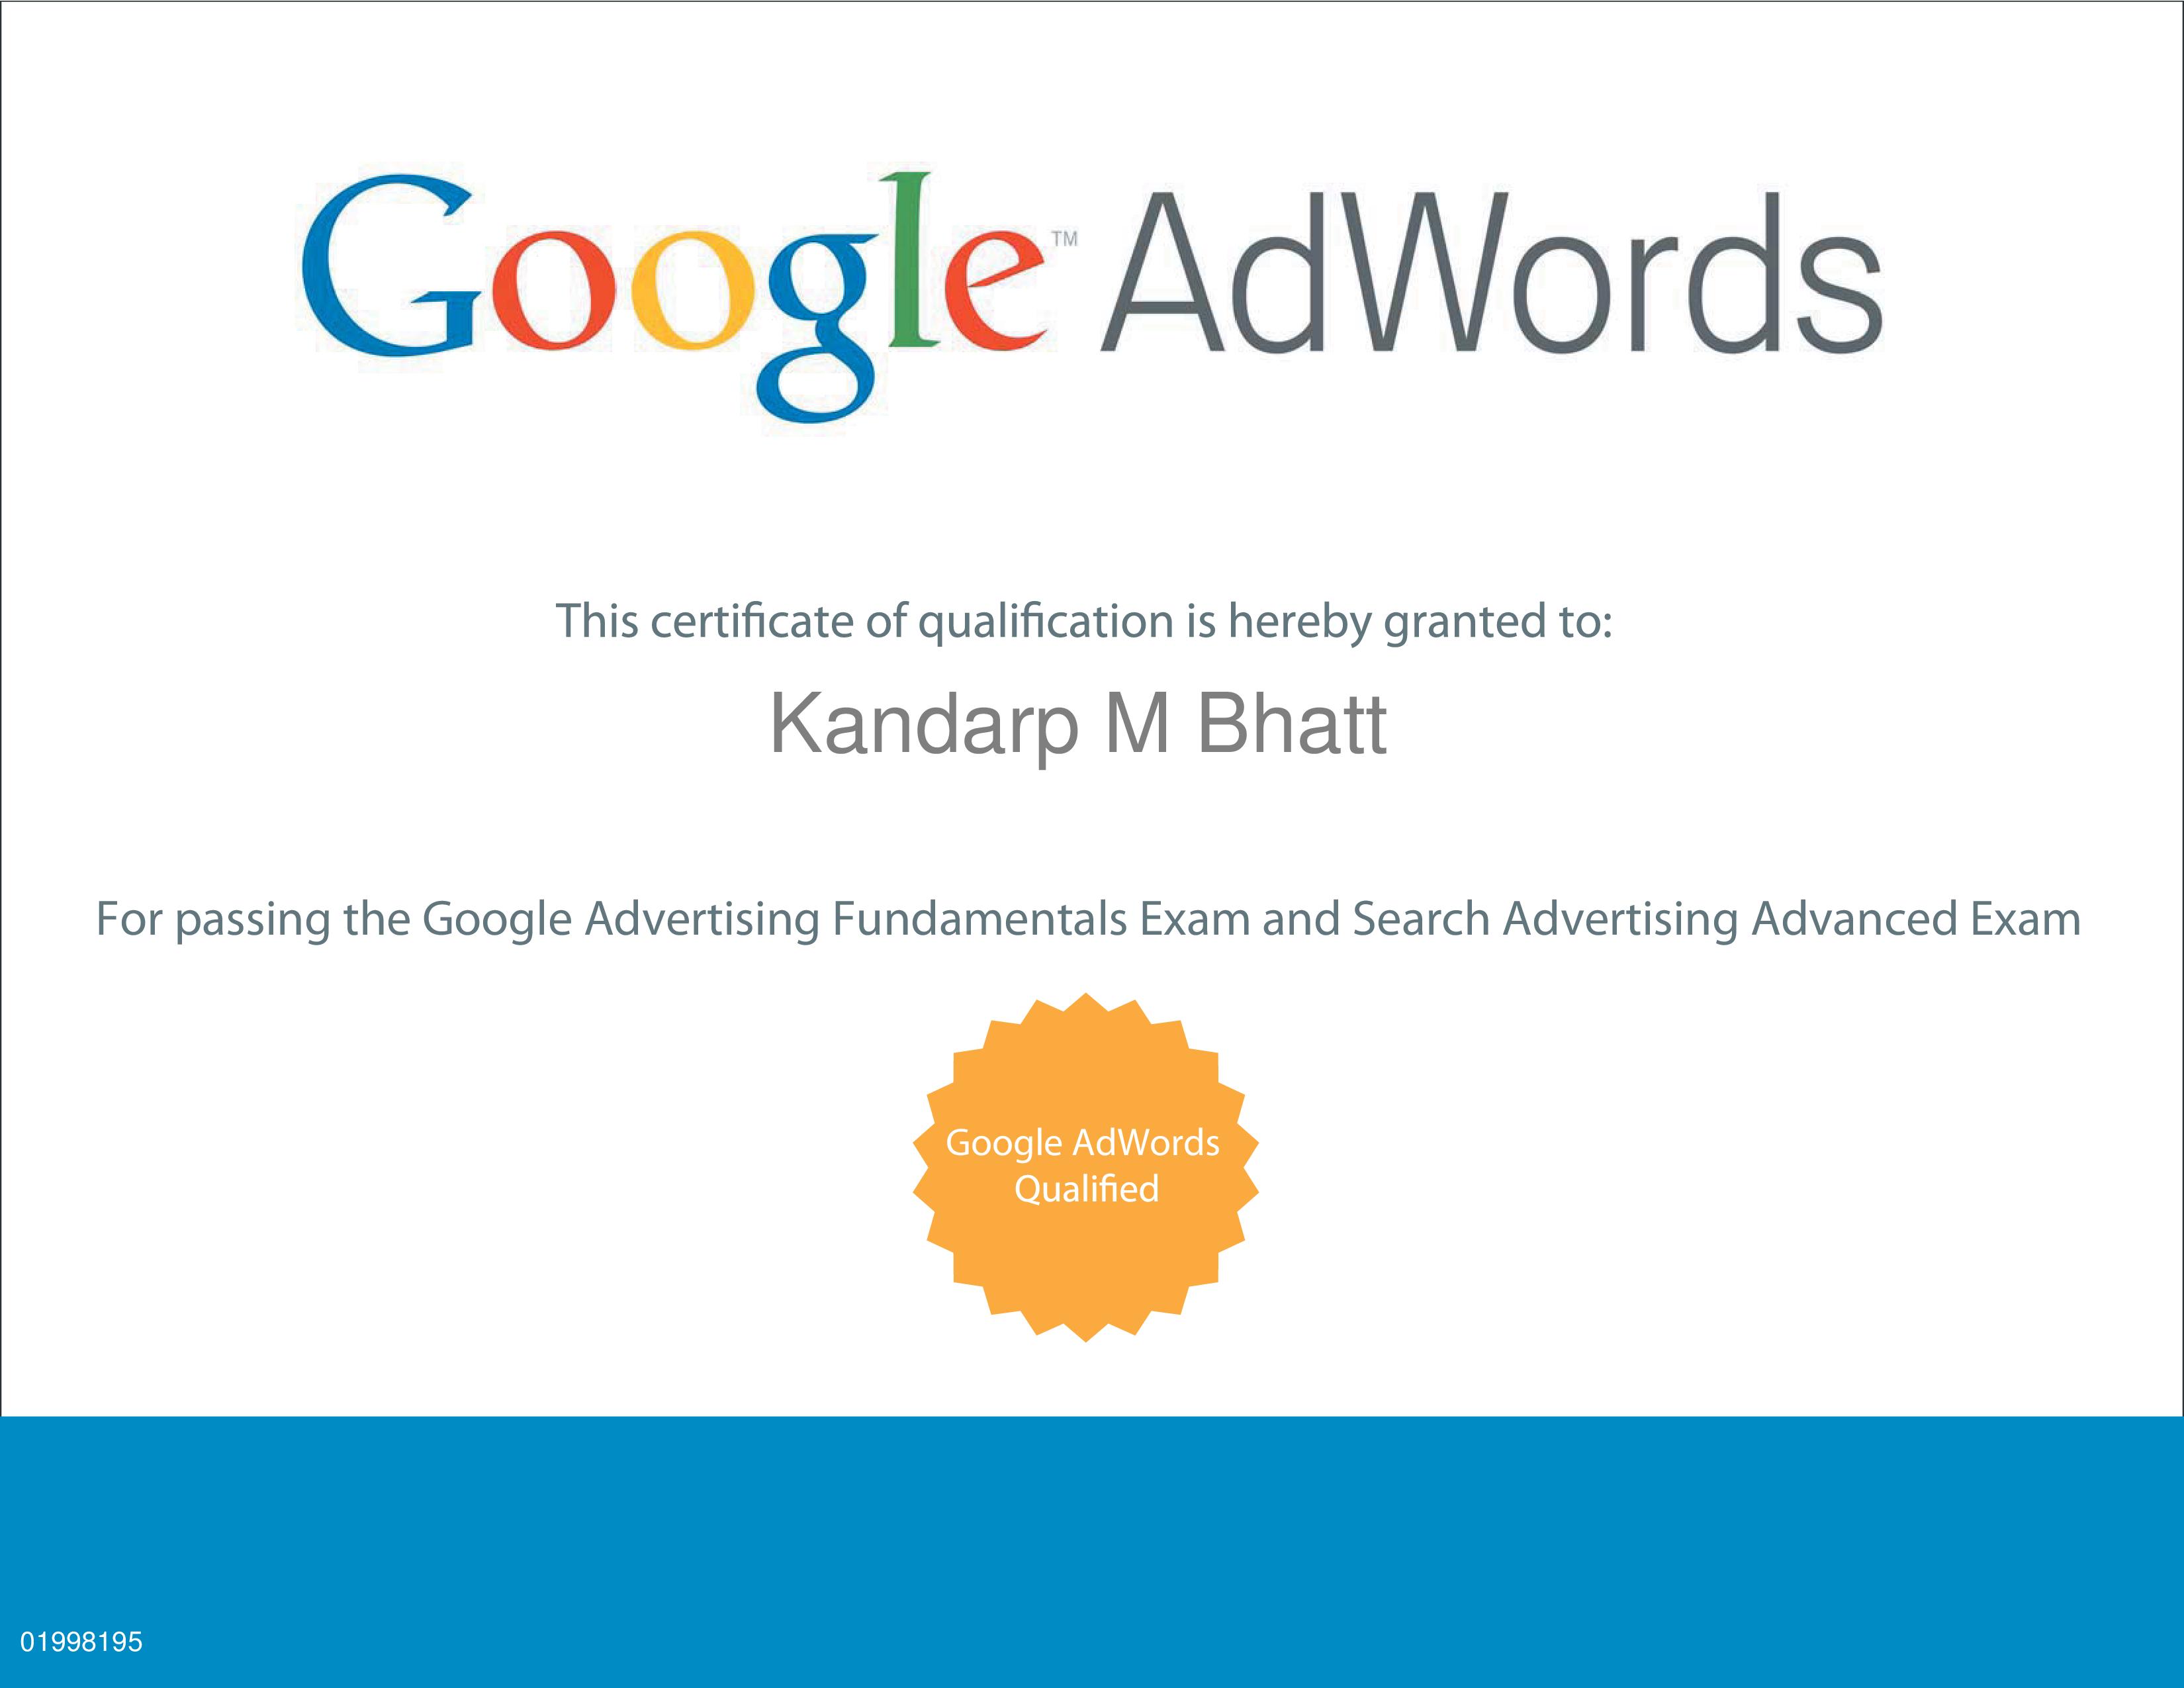 Kandarp M Bhatt Google Adwords Certificate